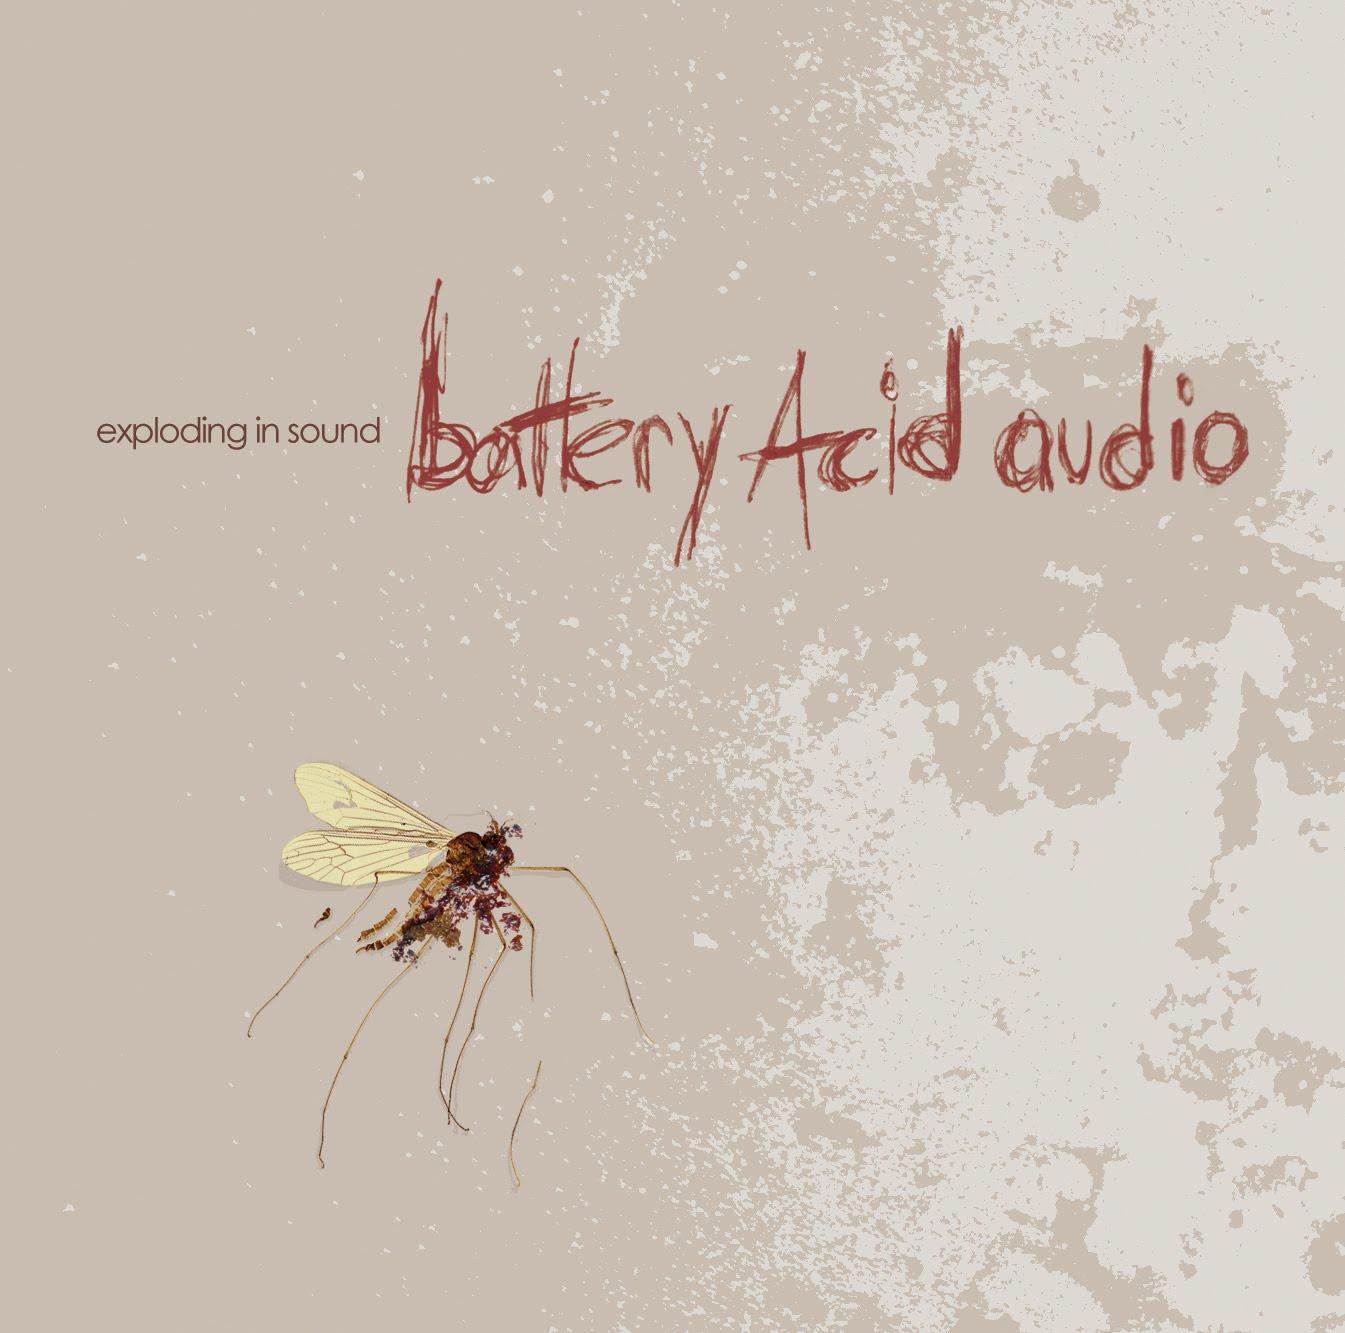 Battery acid music video